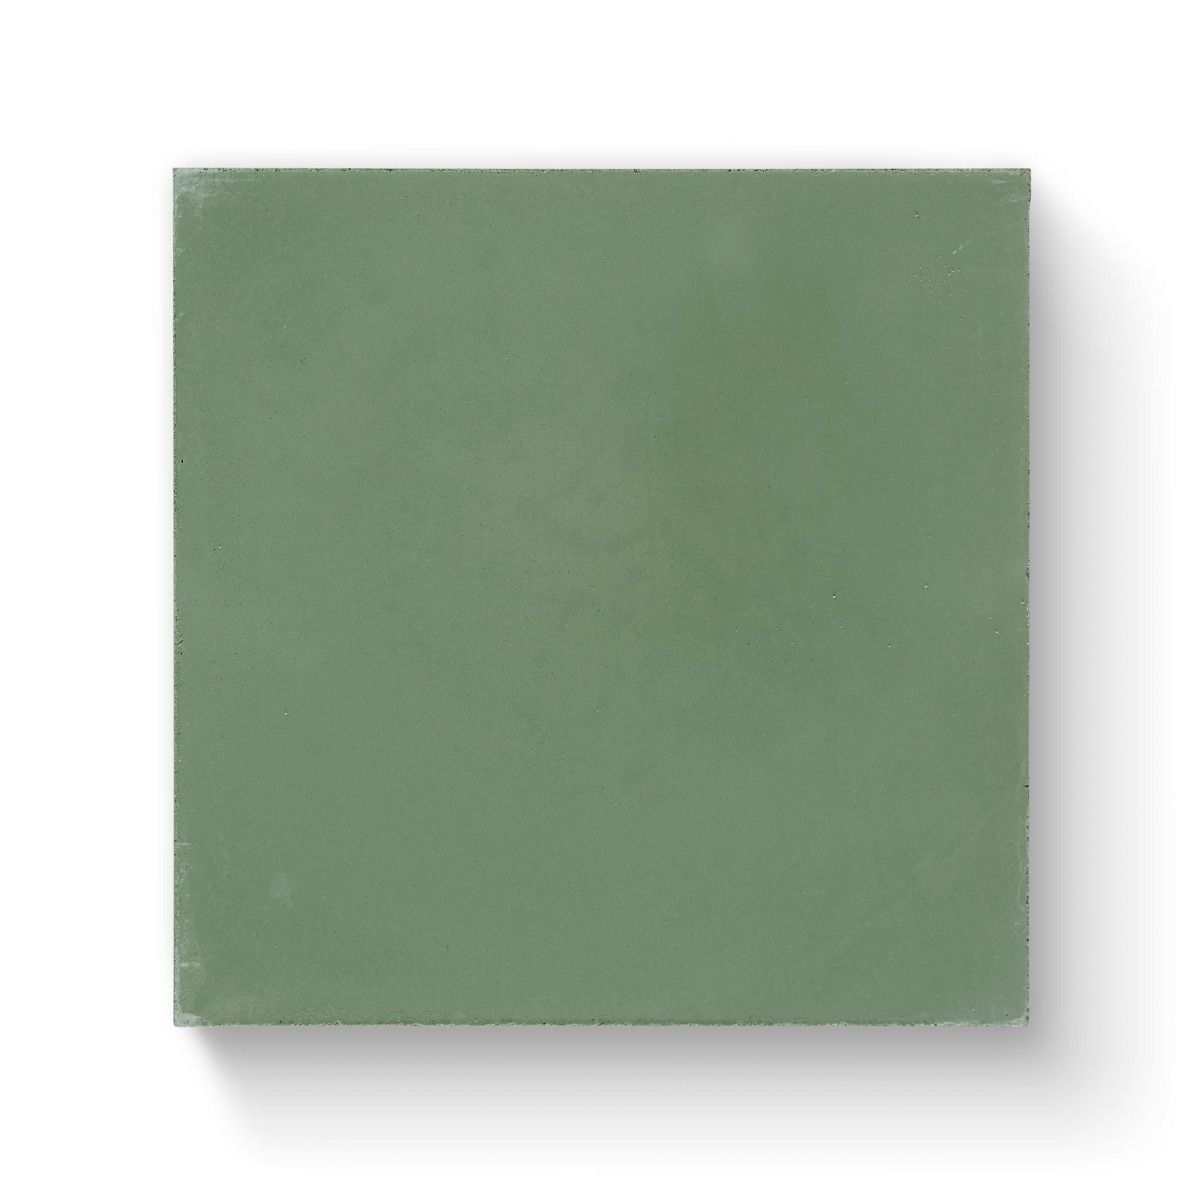 Bert & May Forest Plain Tile 20cm x 20cm